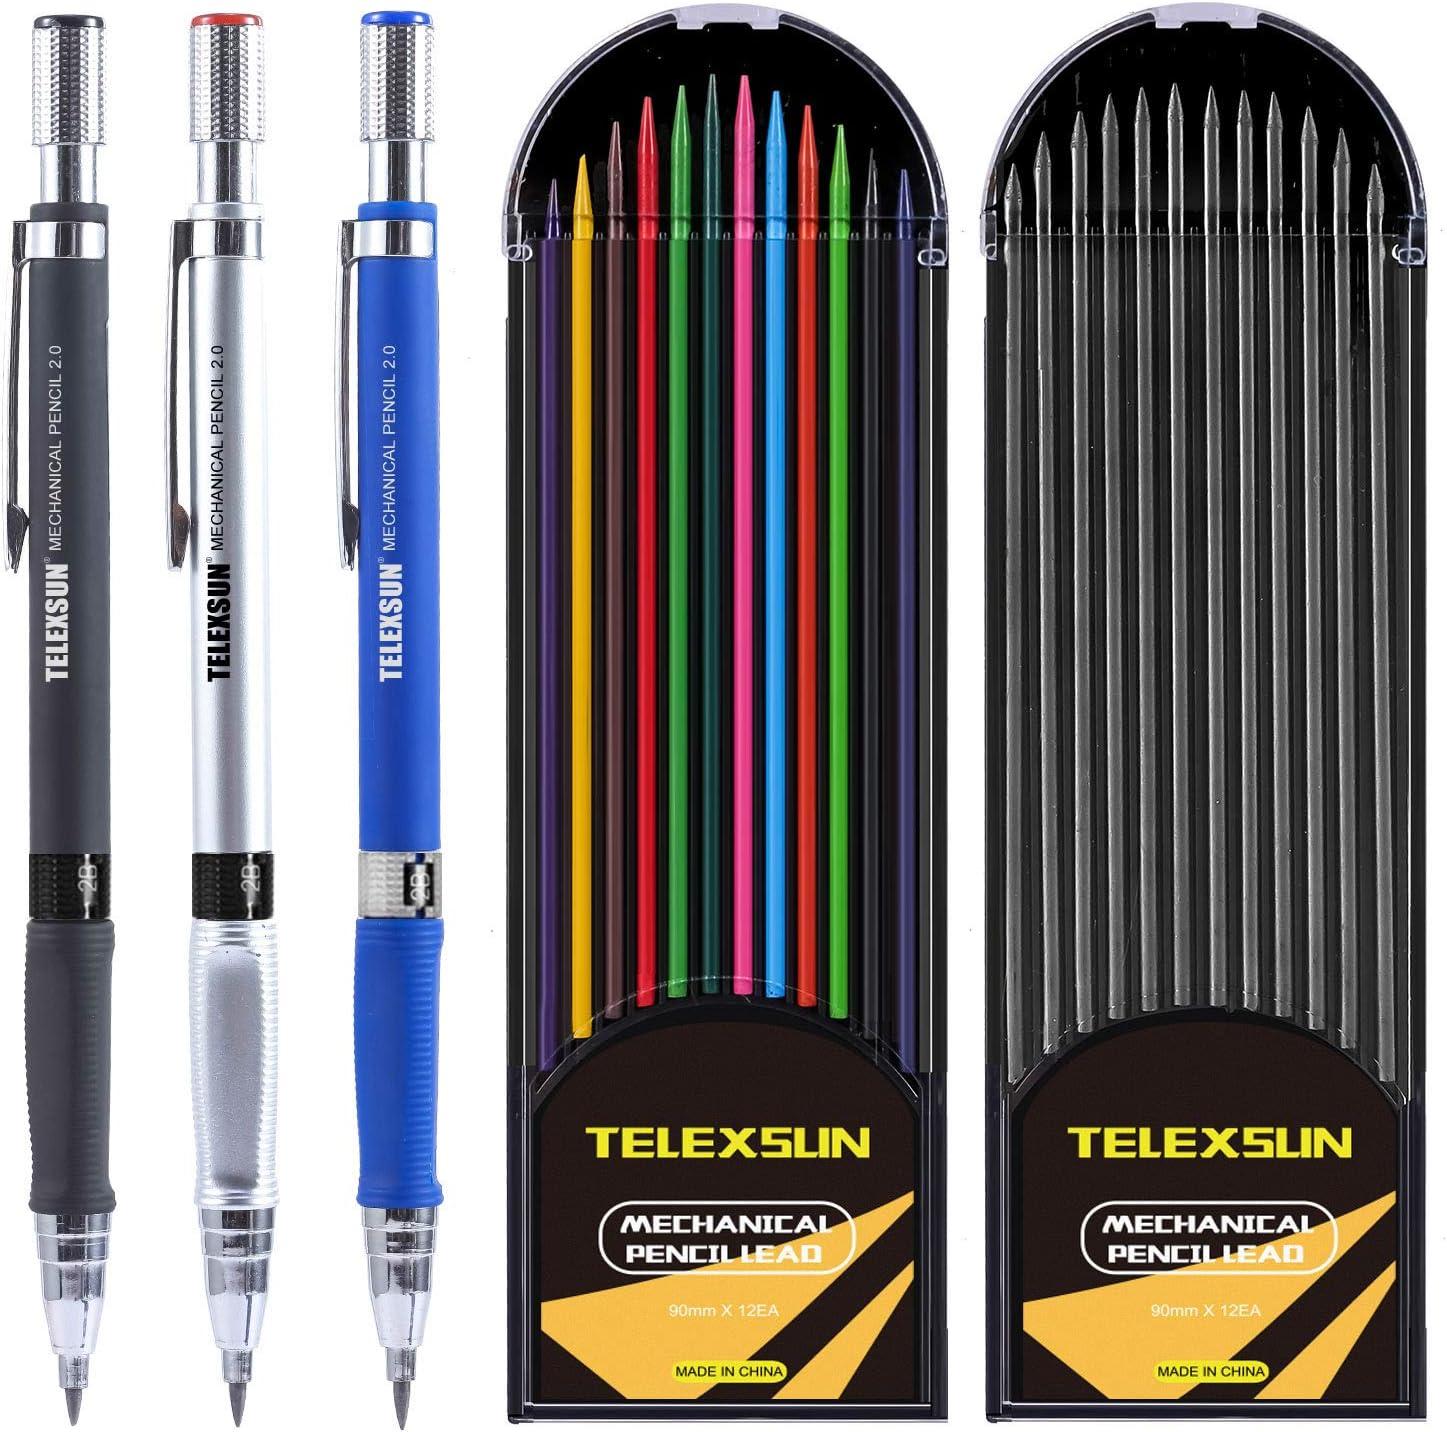 Mechanical Pencil Set - 3 Pack Mechanical Pencil with 2 Cases Le